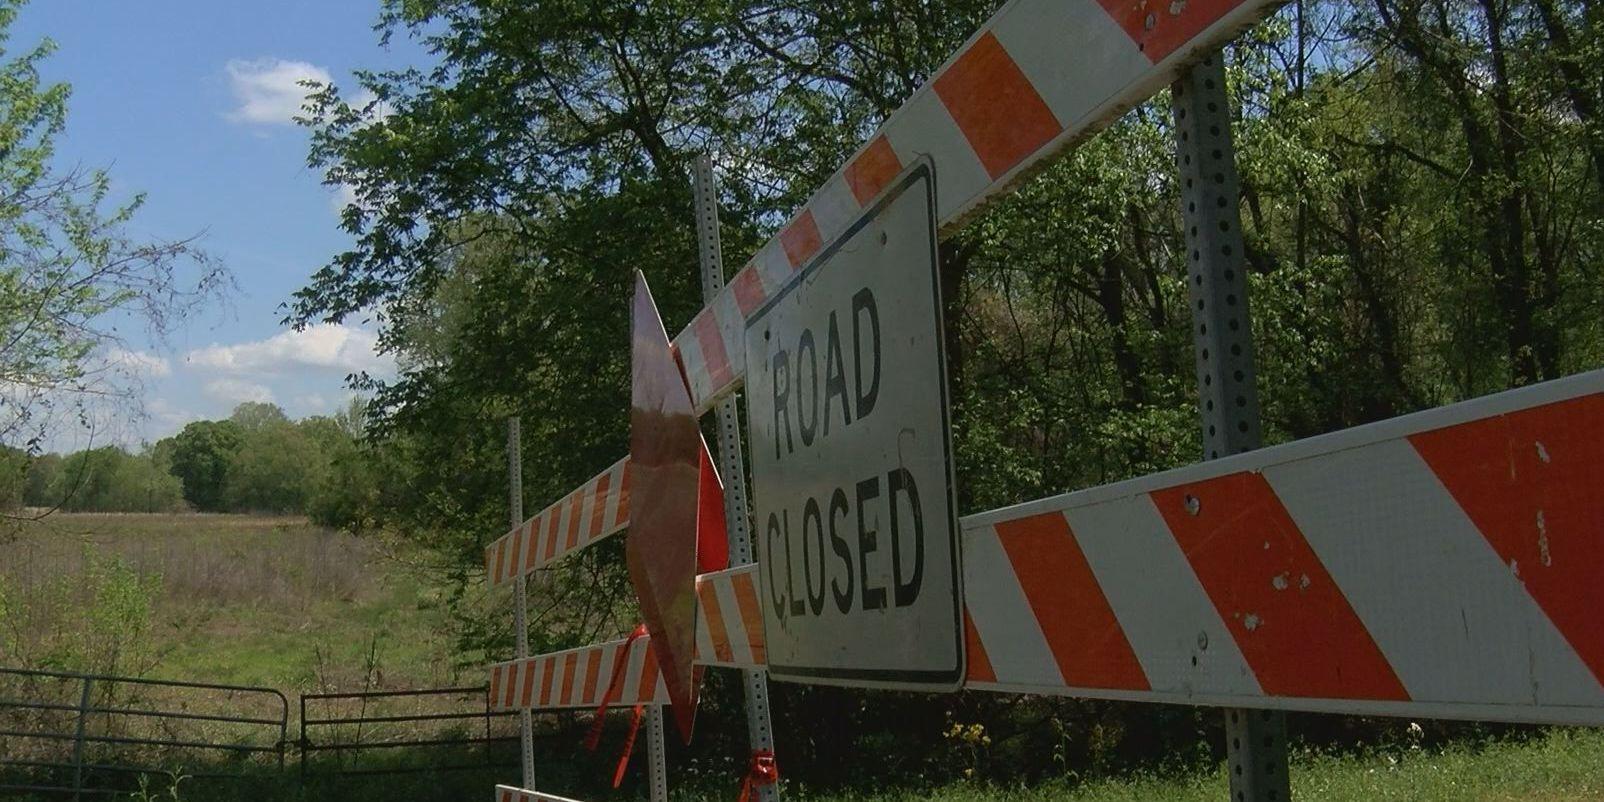 More than 500 Mississippi bridges remain closed